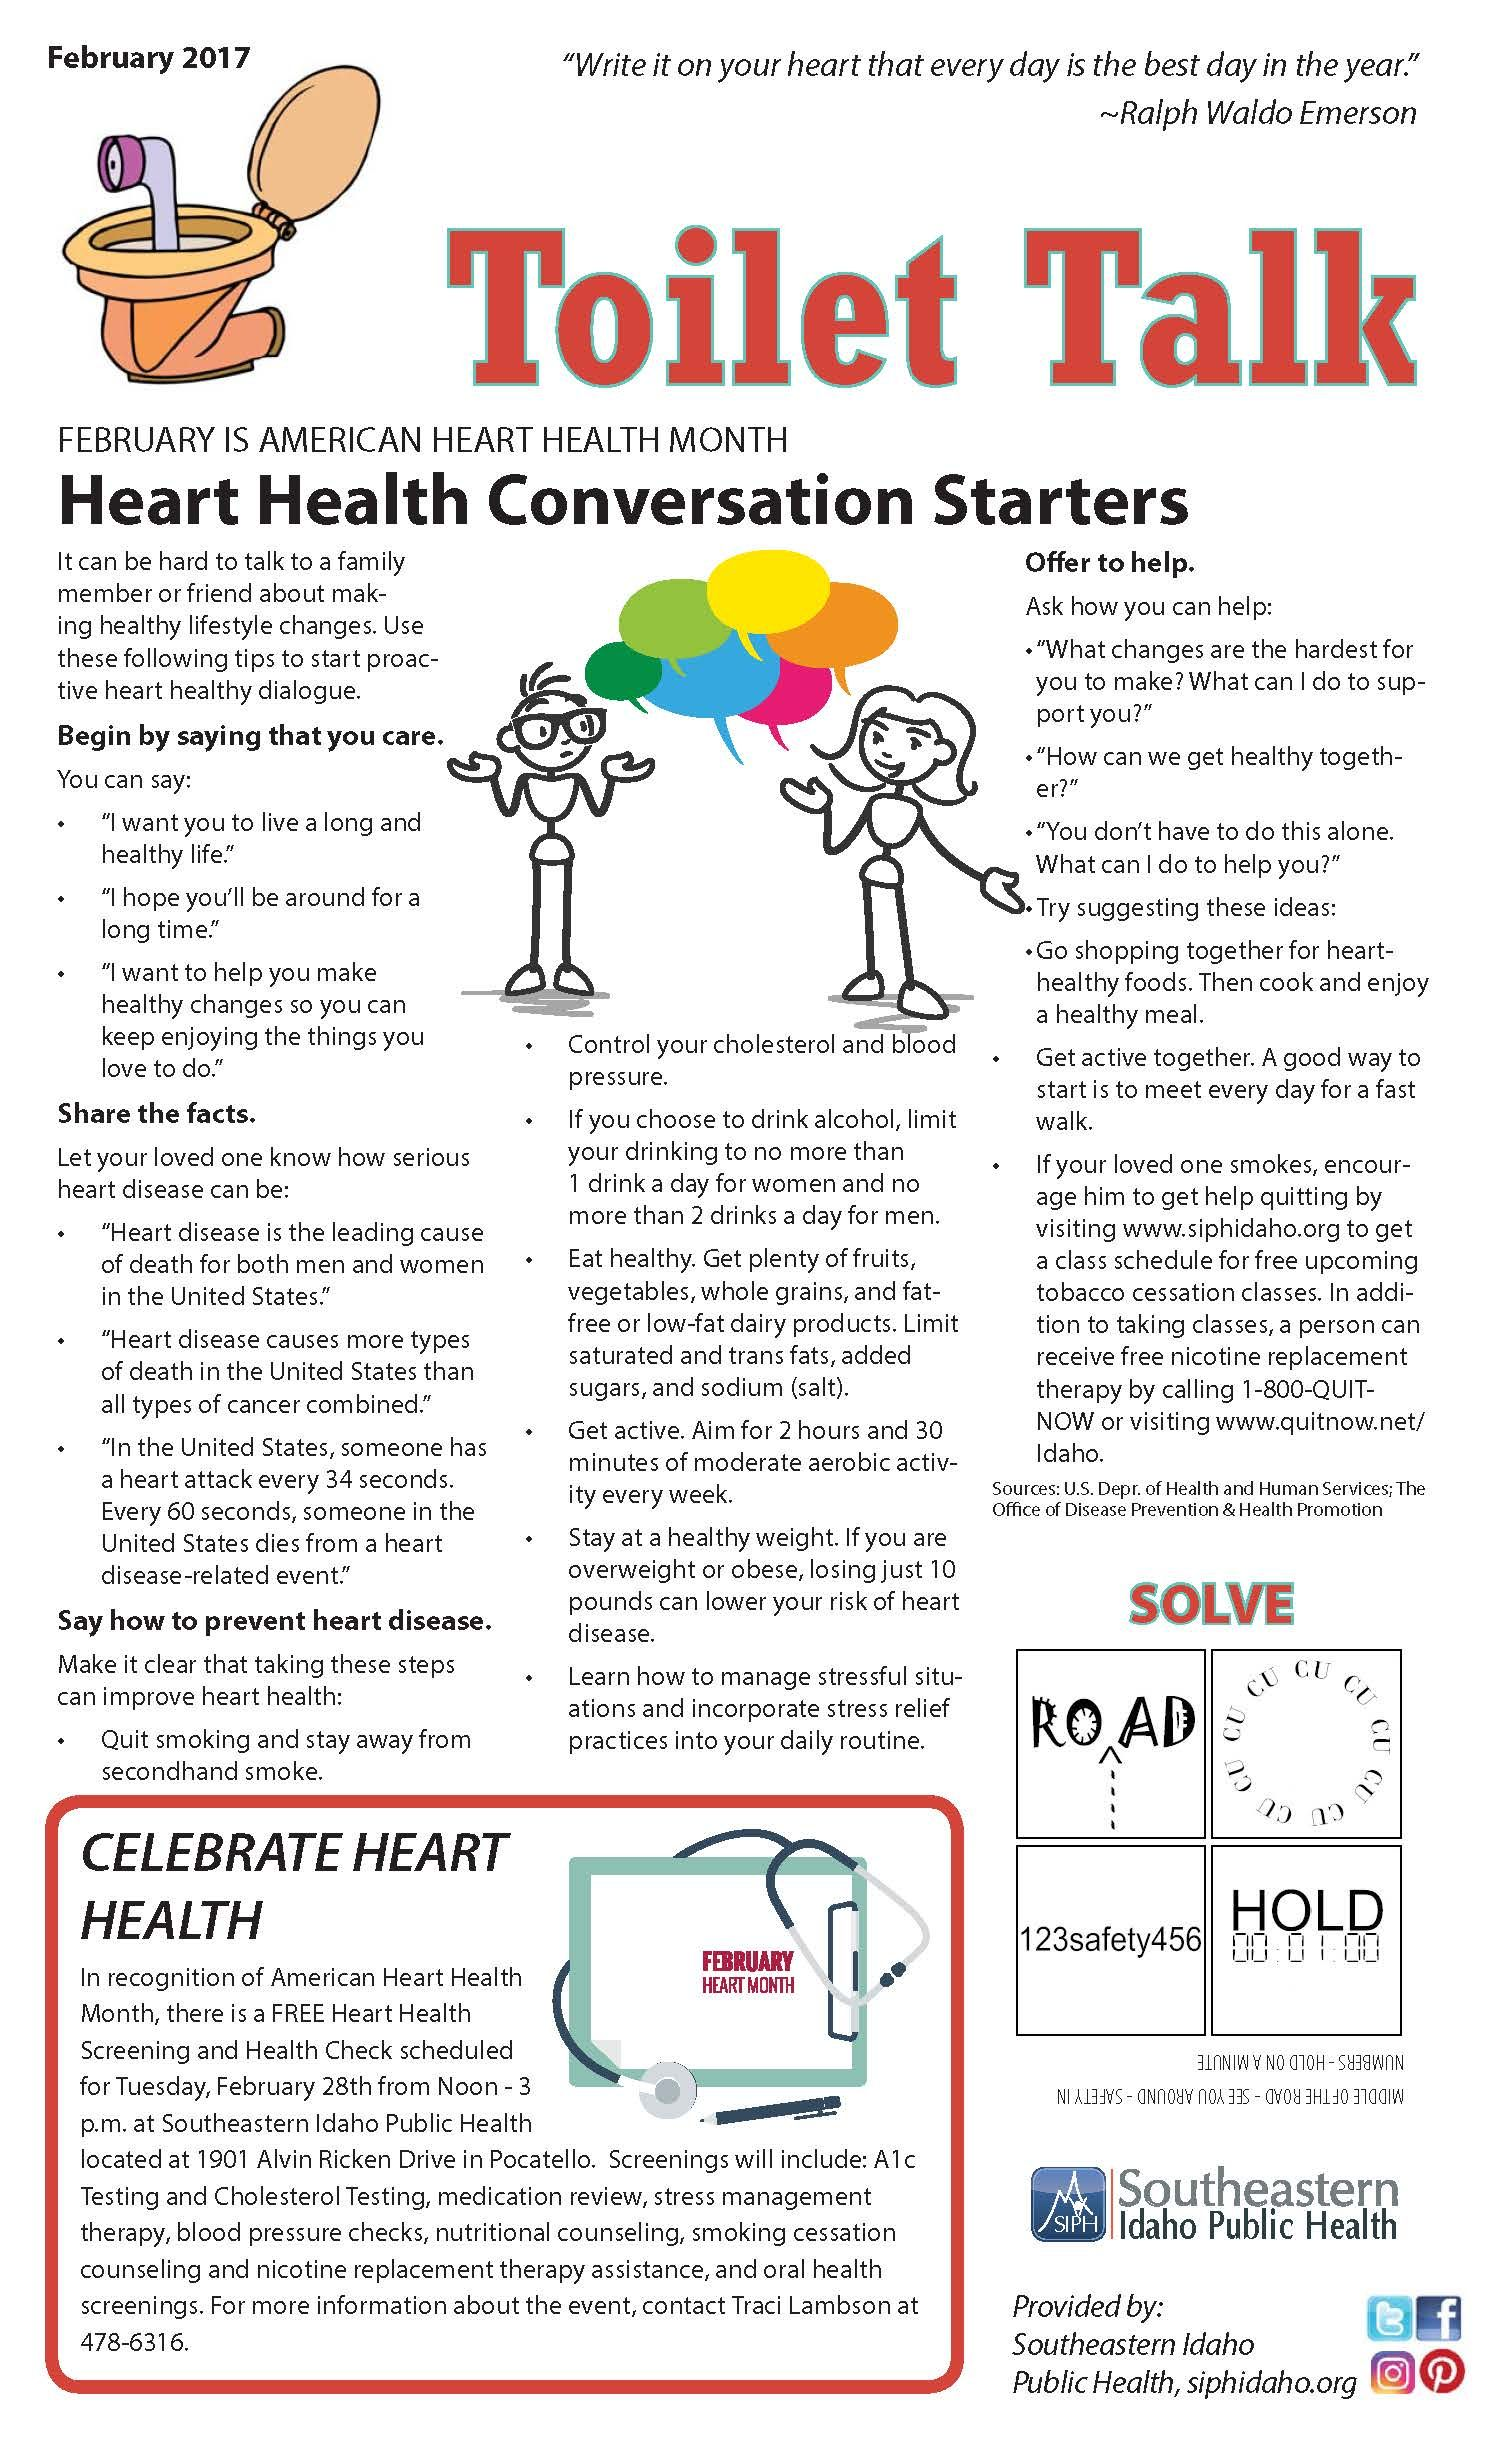 Heart Health Conversation Starters | Toilet Talk | Pinterest ...